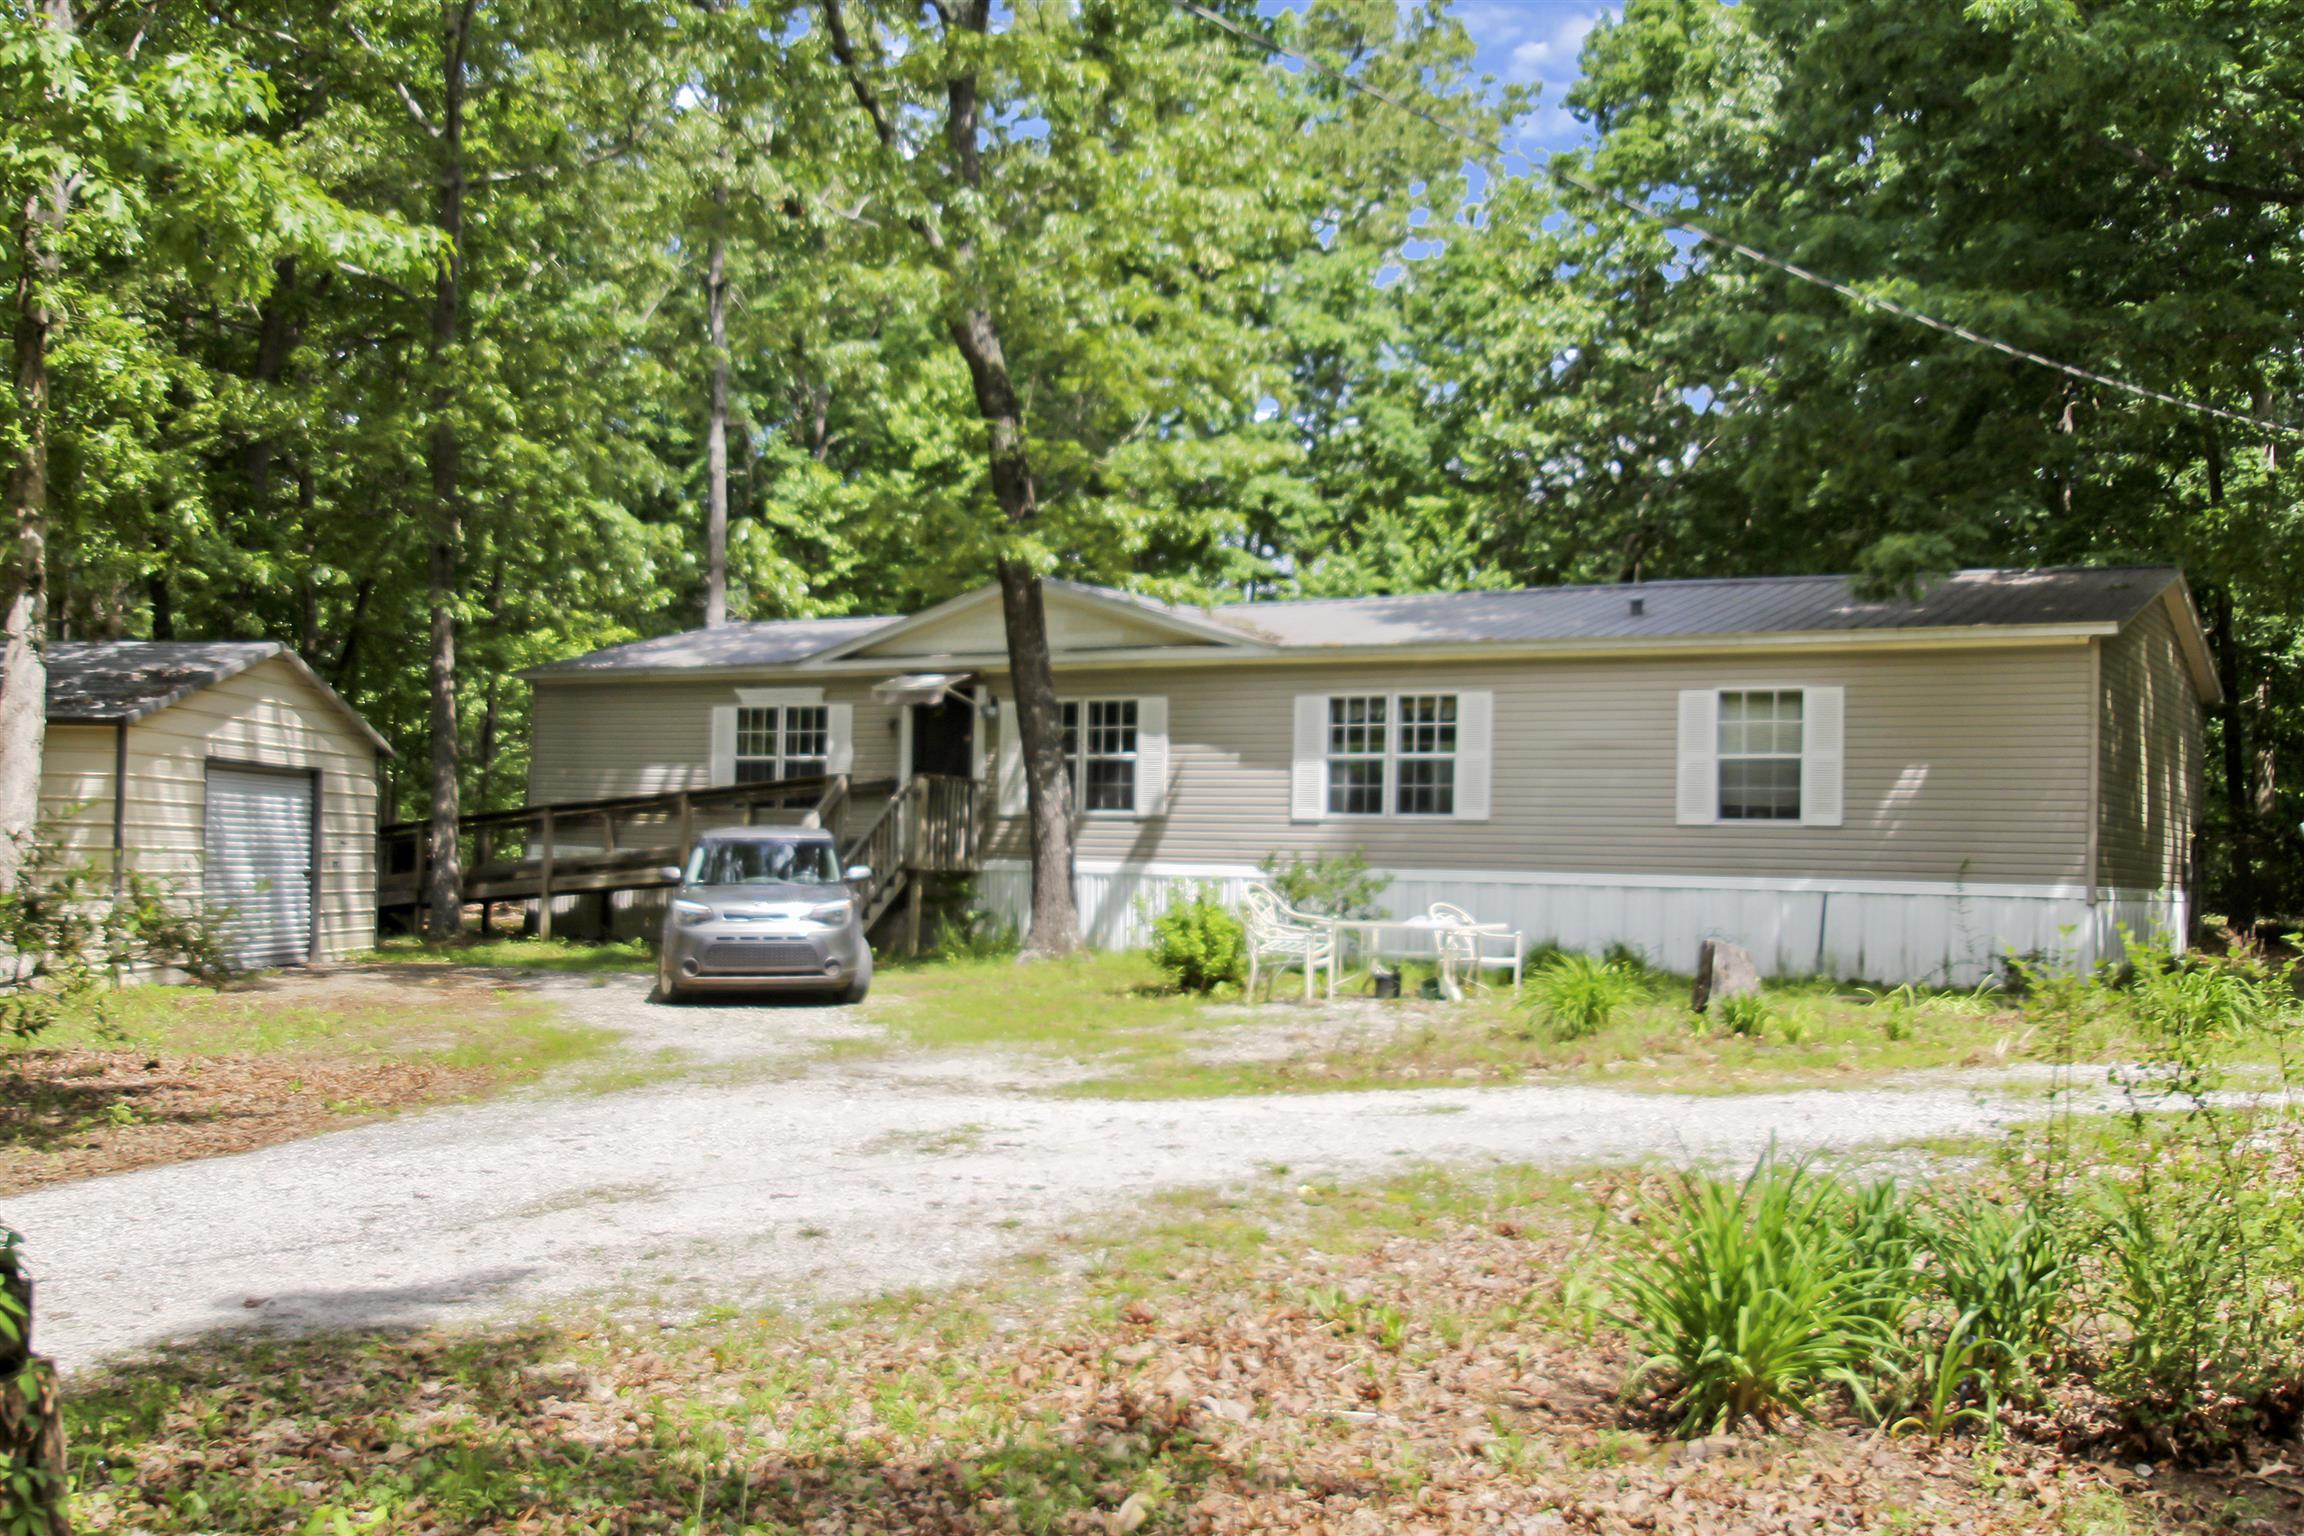 94 Cheyenne Cir, Beechgrove, TN 37018 - Beechgrove, TN real estate listing